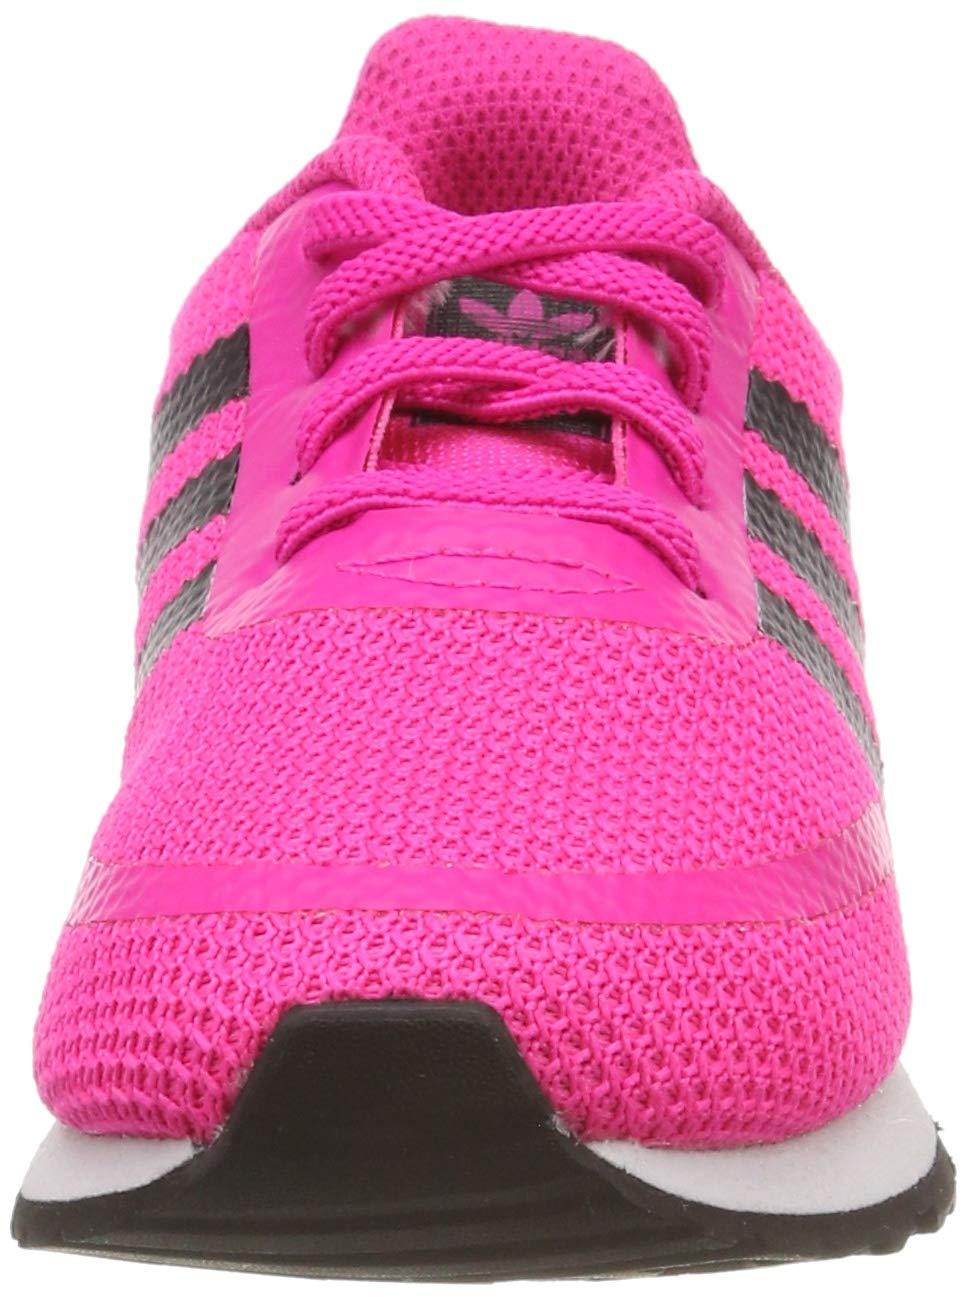 adidas N-5923 El I Scarpe da Fitness Unisex – Bambini 4 spesavip